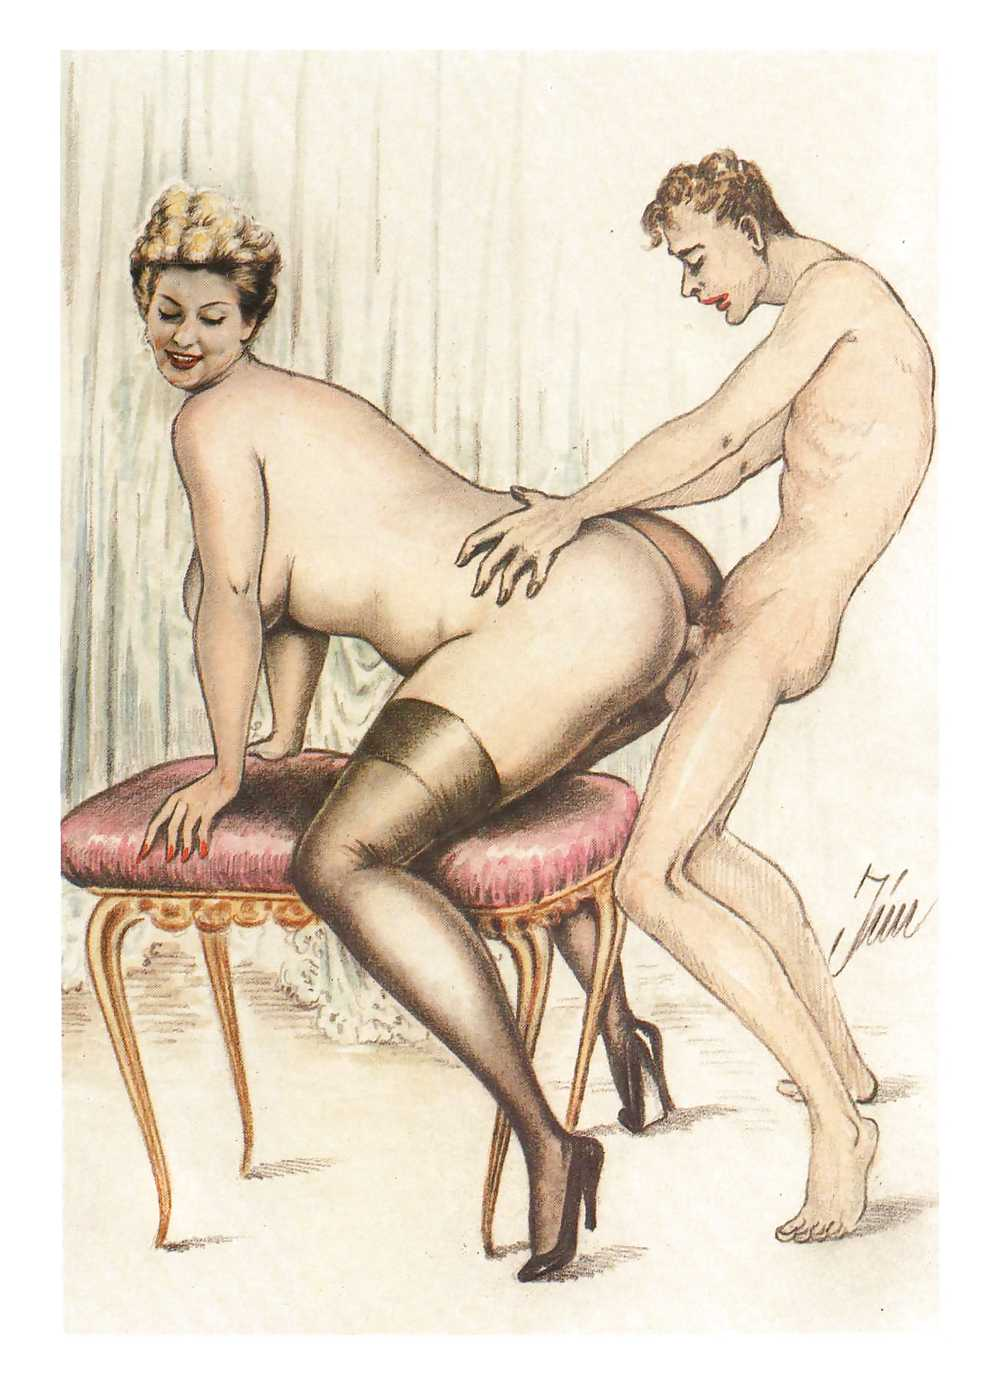 Erotic Vintage drawings Porn Pics #295952